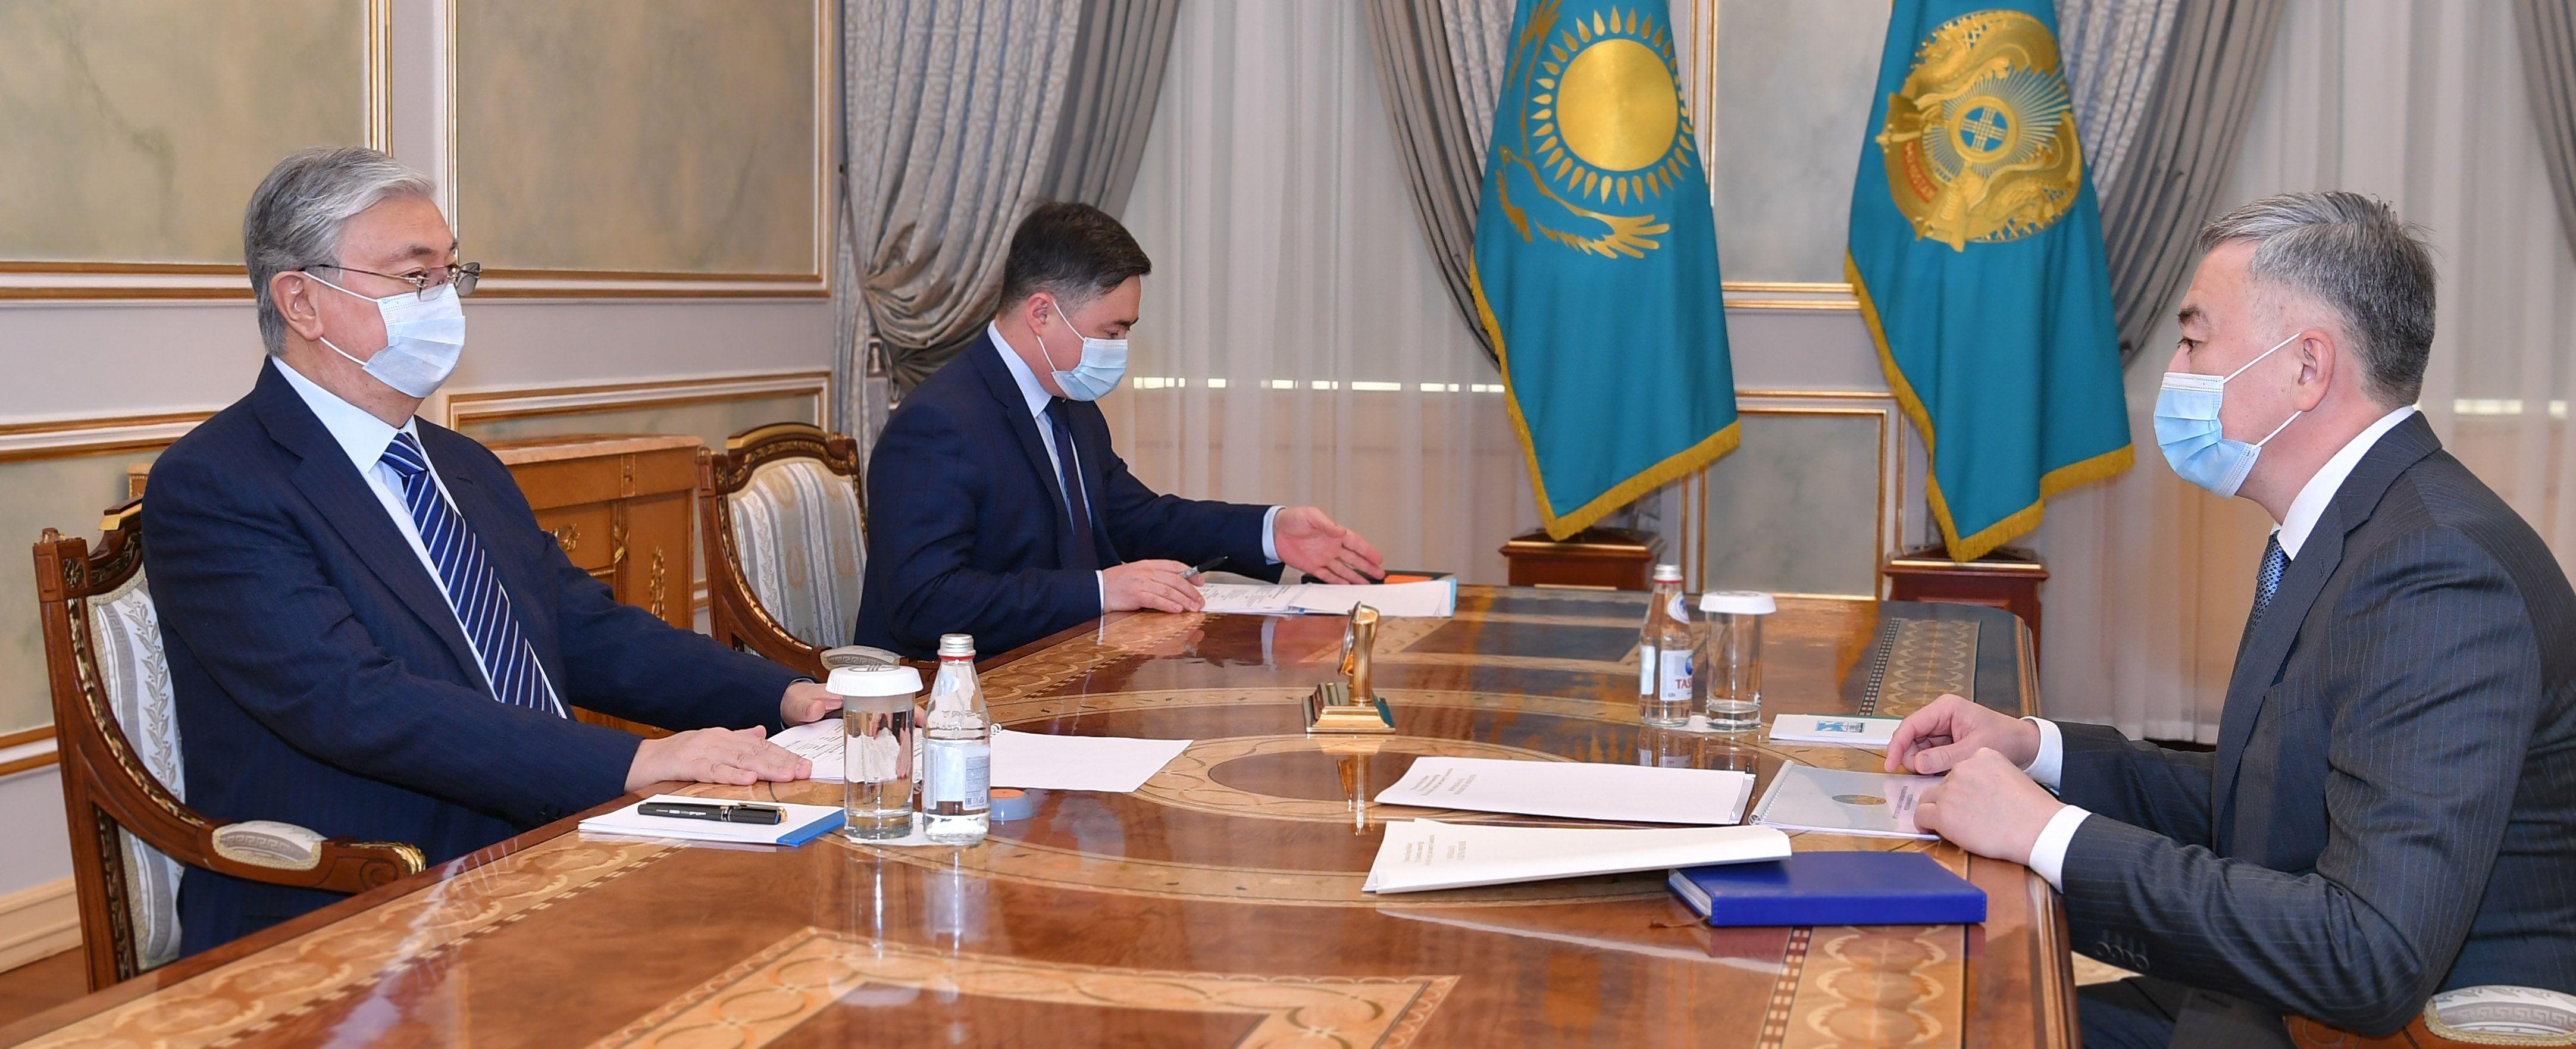 Президент заслушал отчет Серика Жумангарина 552969 - Kapital.kz